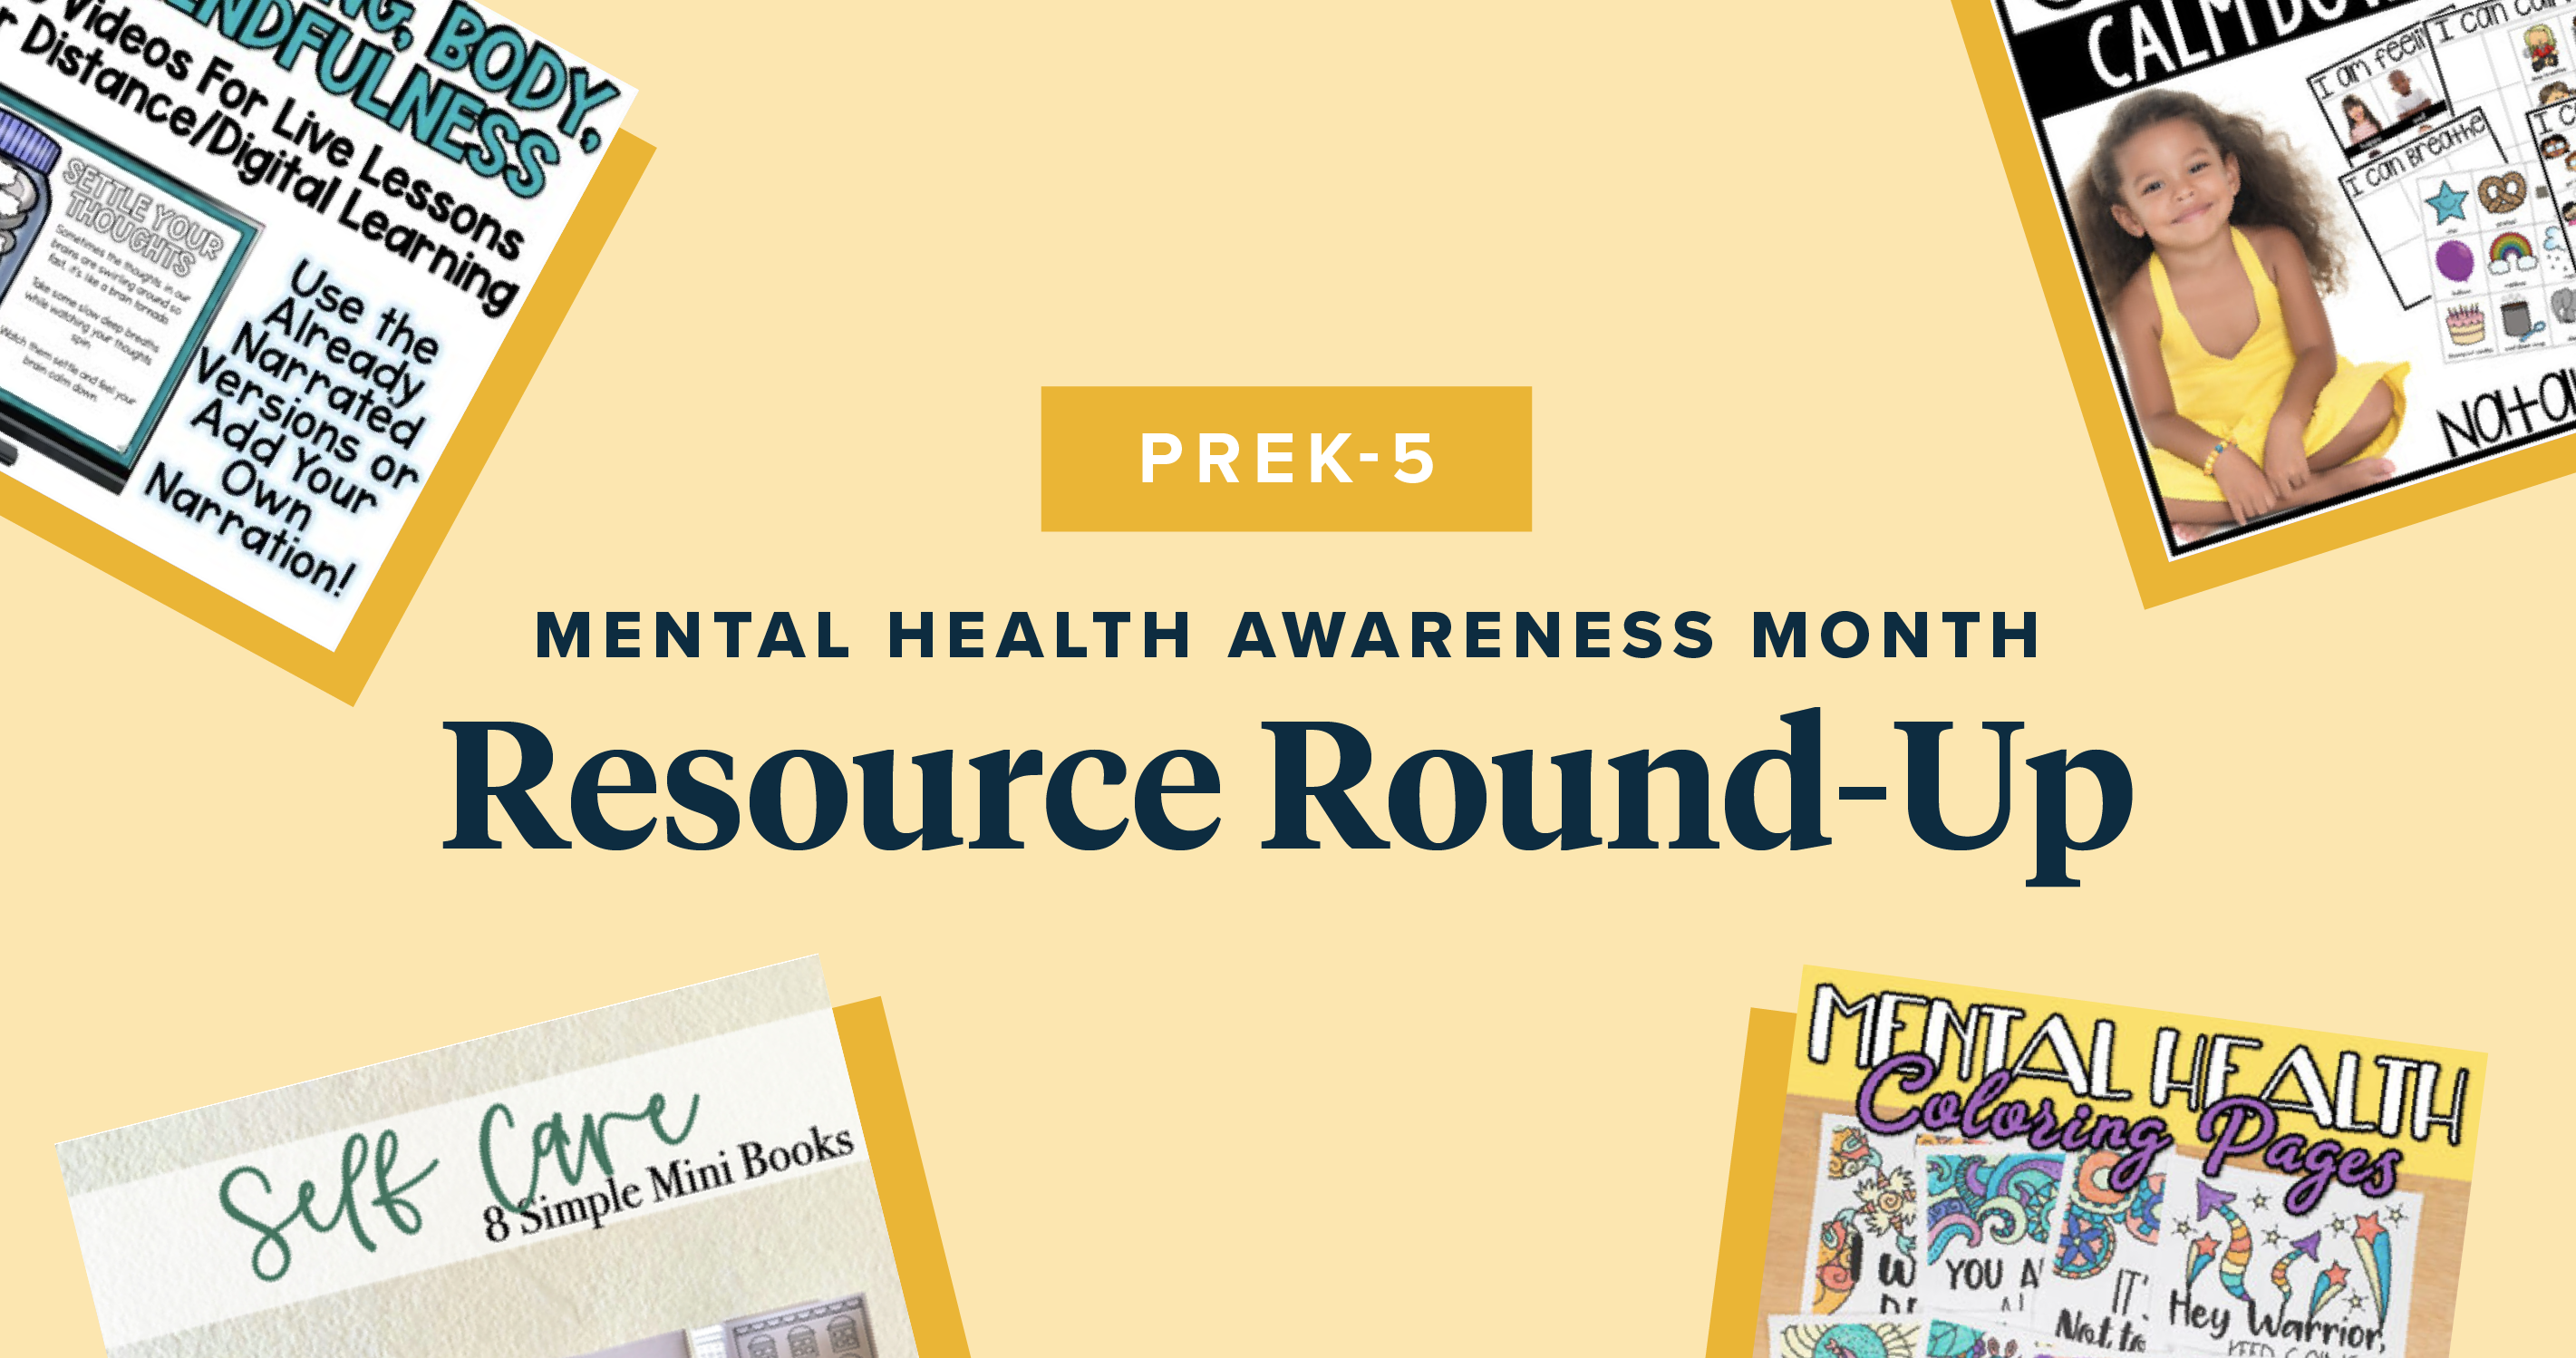 PreK-5 Mental Health Awareness Month Resource Round-Up